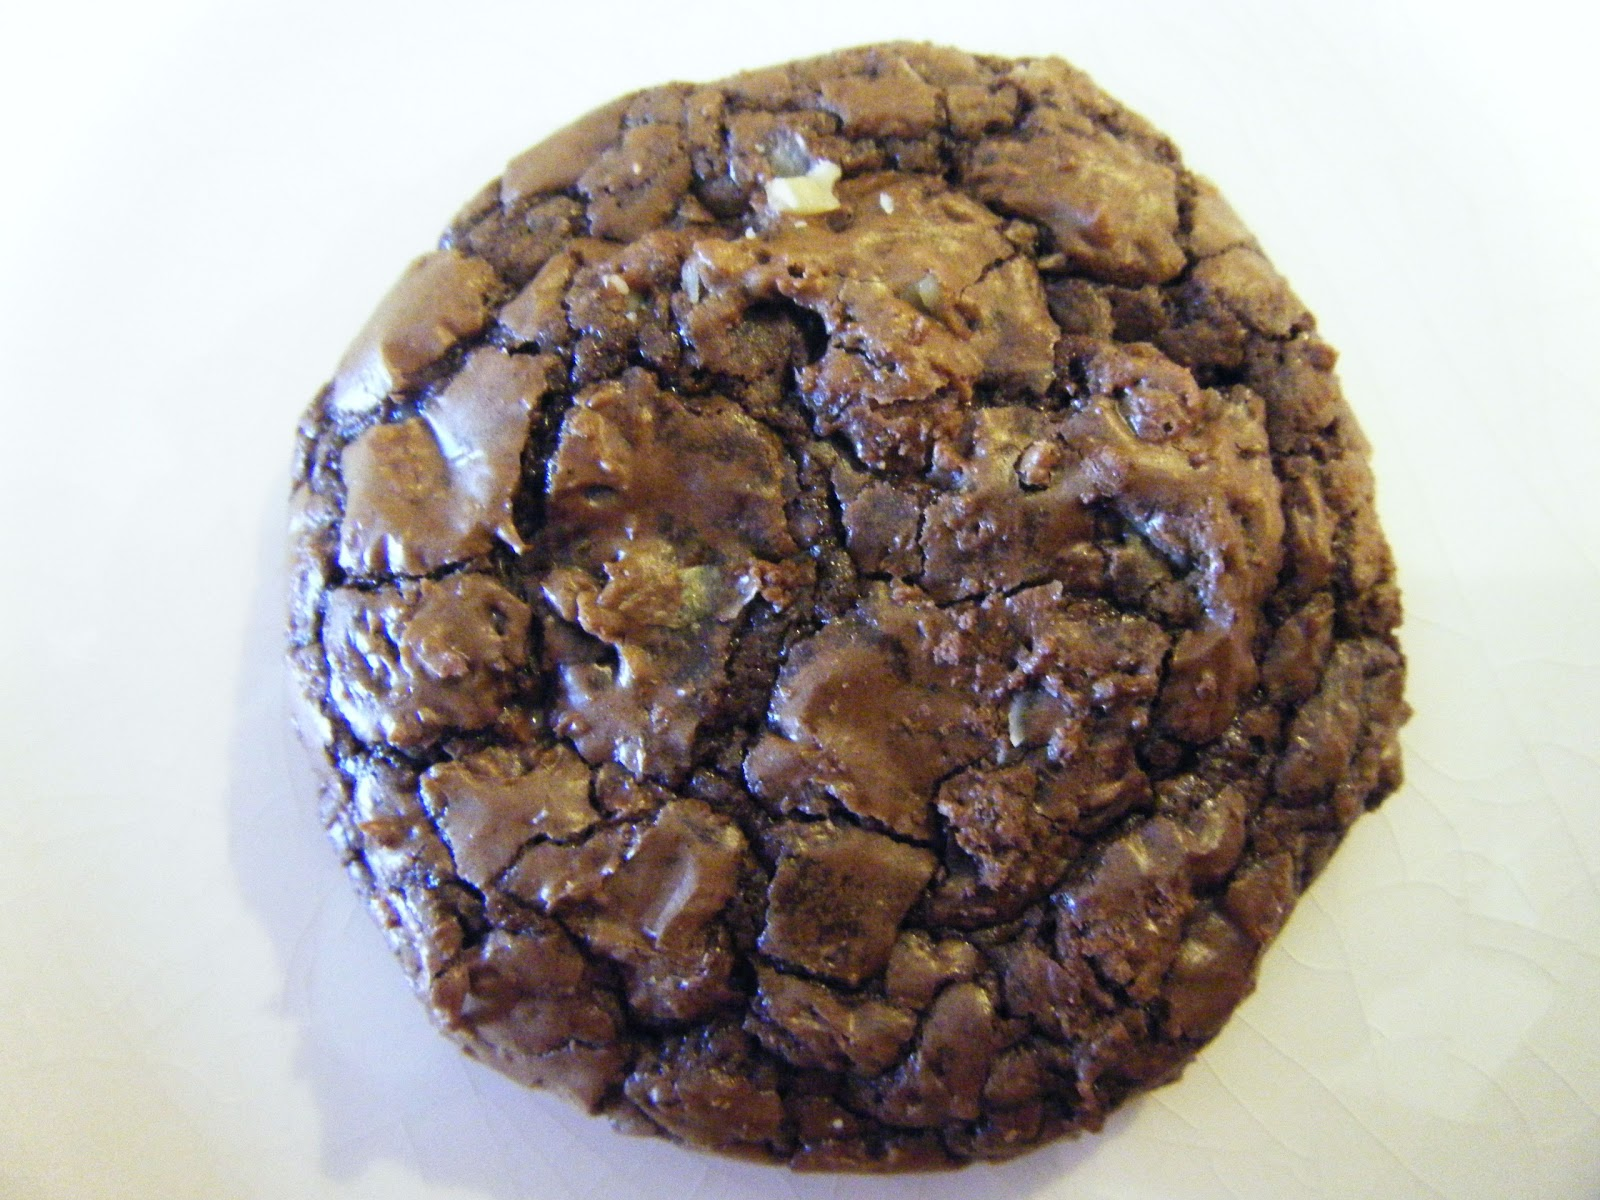 west side baker: Giant Chocolate-Toffee Cookies